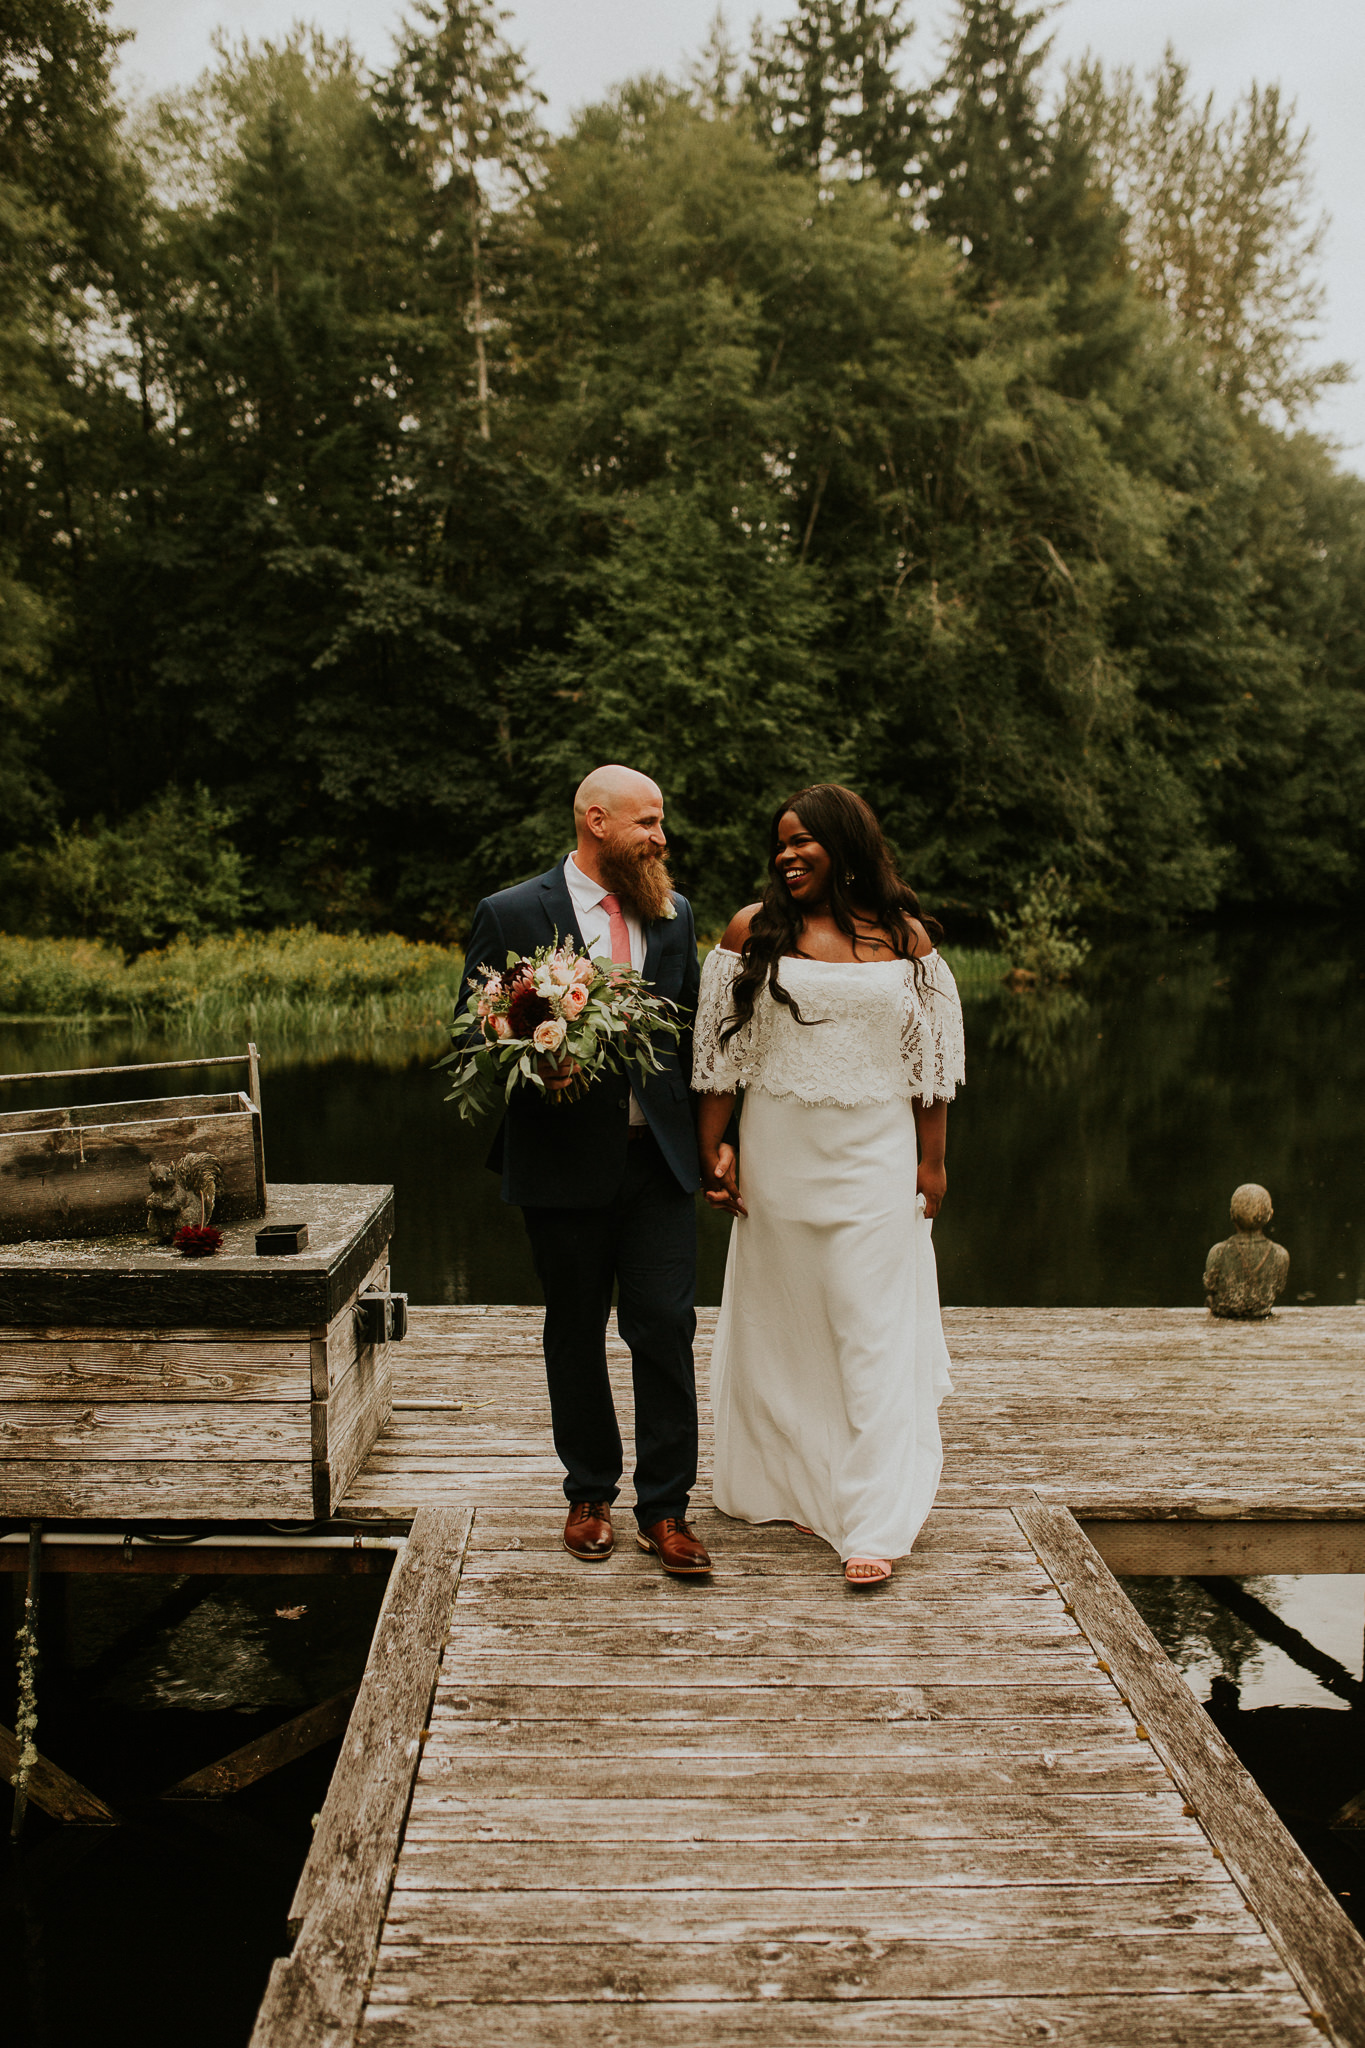 Lakeside-elopement-teasers-15.jpg